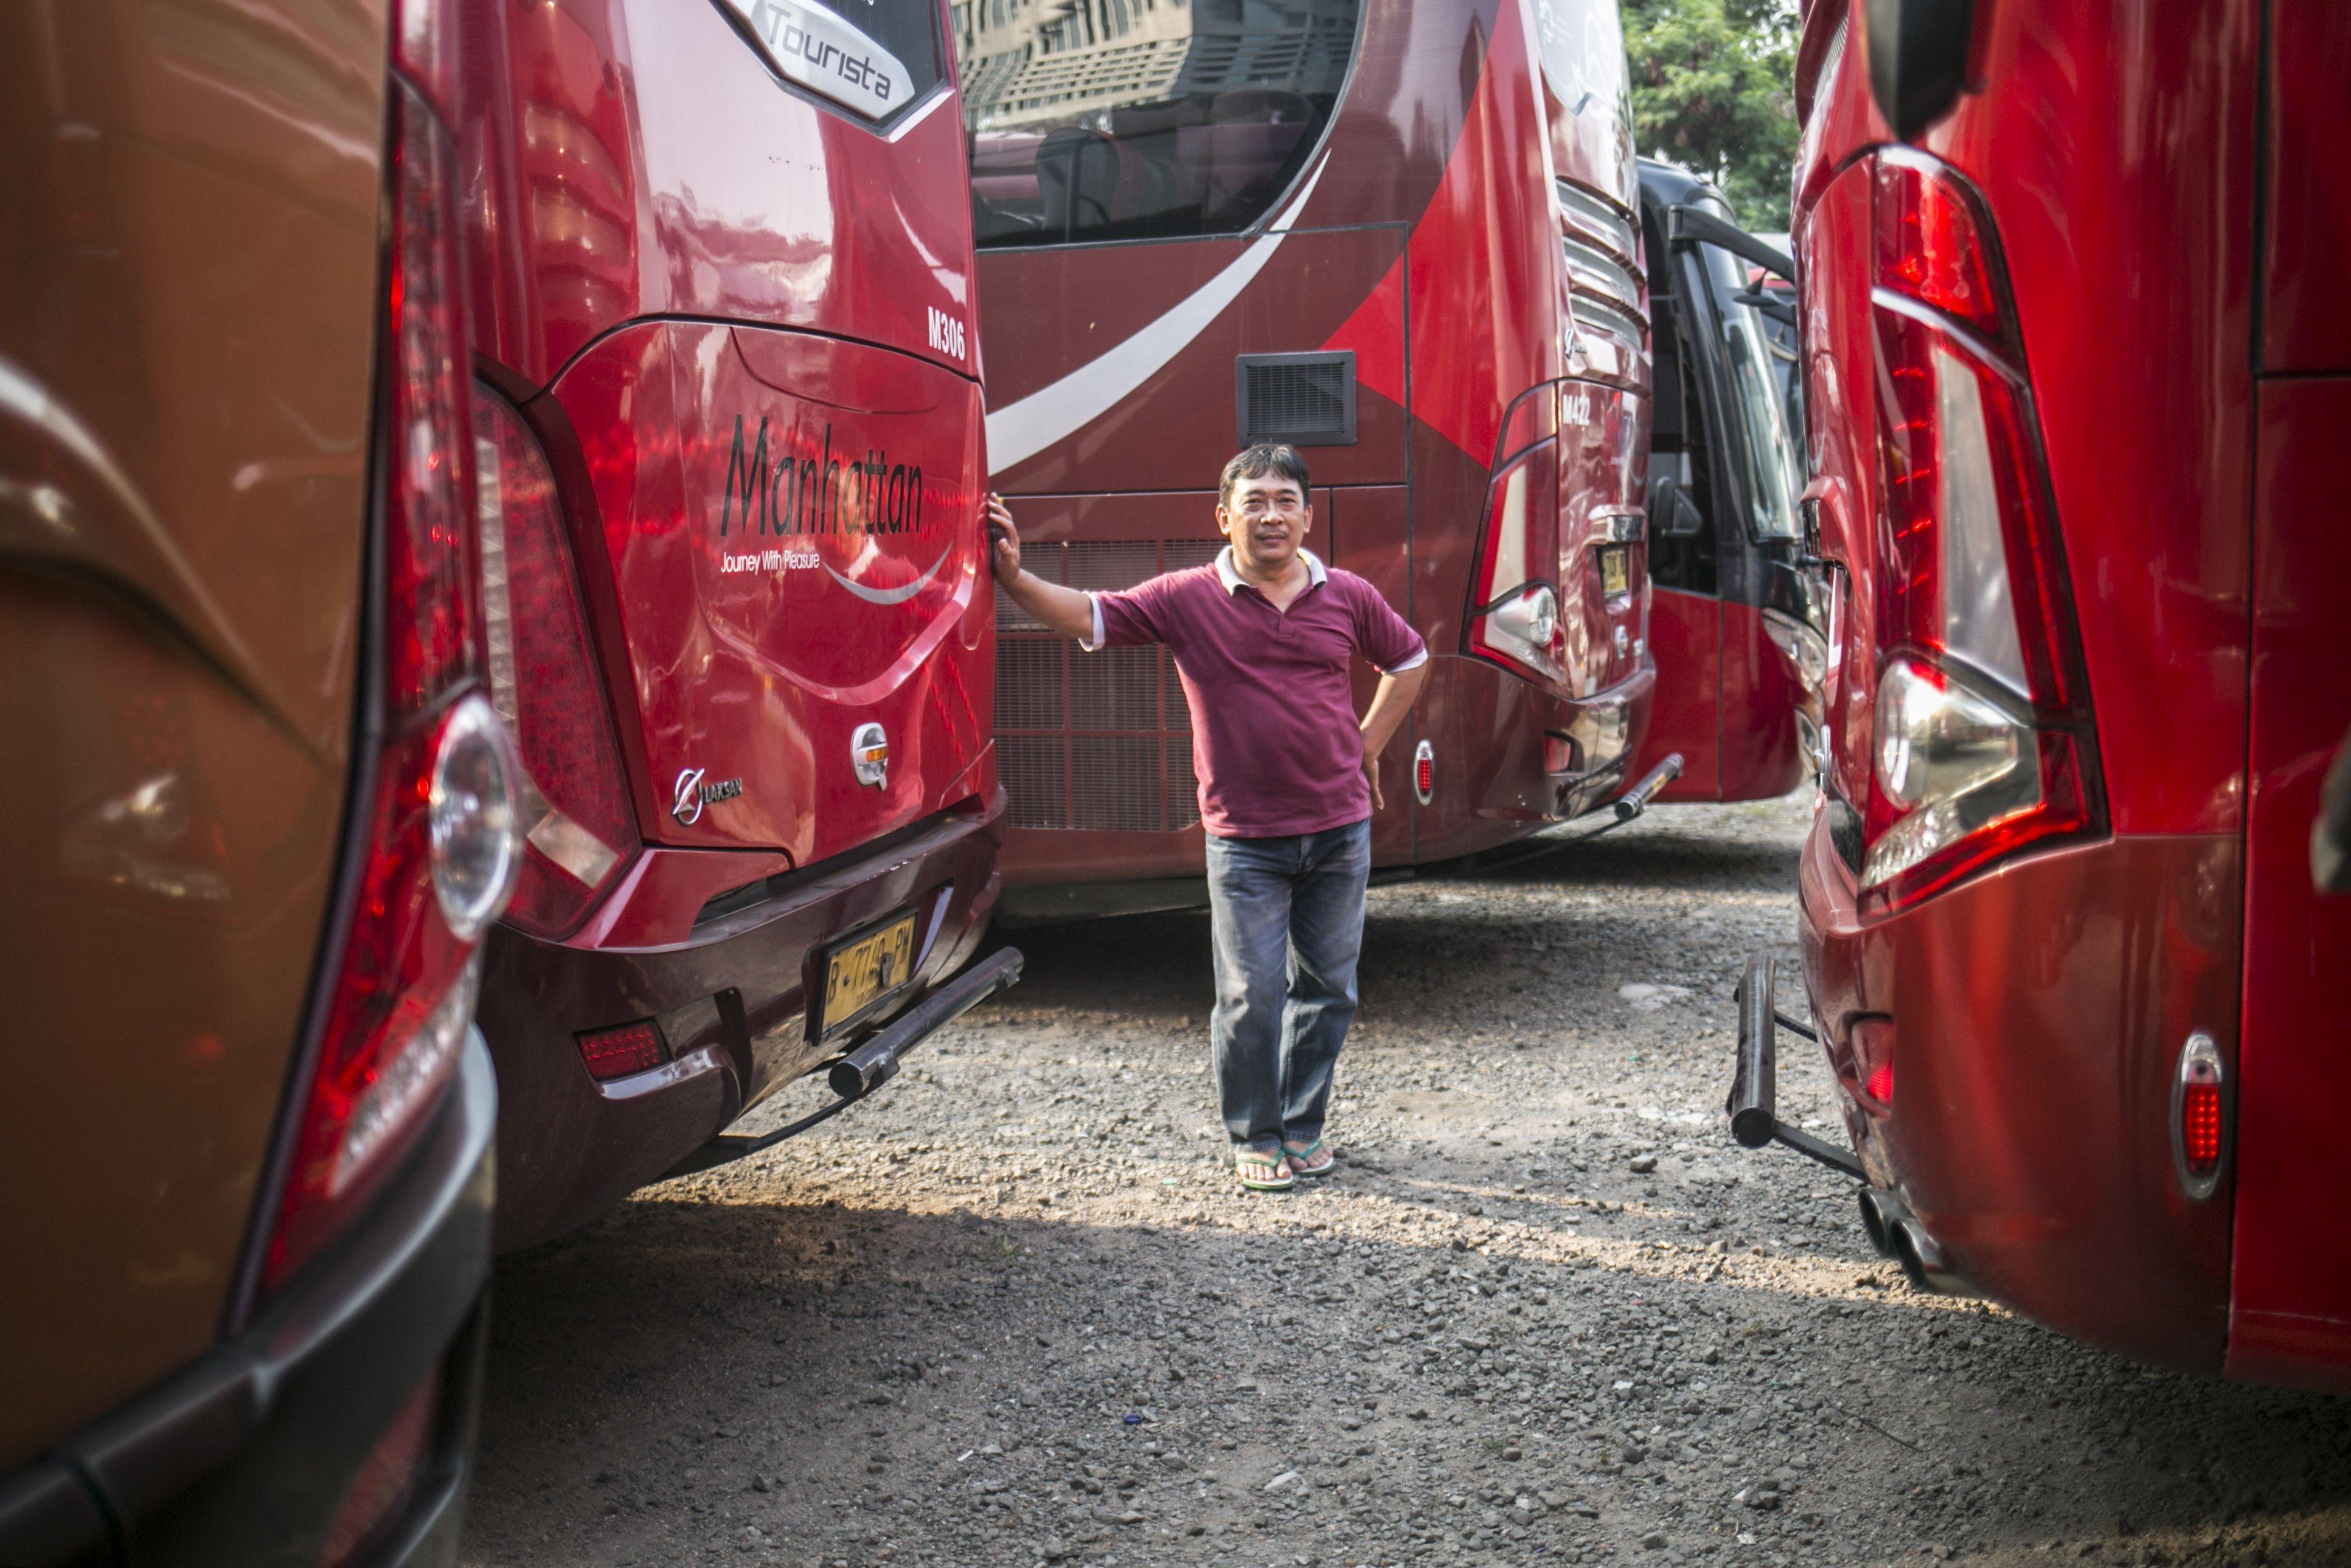 Potret driver bus, Ridwan (45) di salah satu pool bus pariwisata di kawasan Tanjung Barat, Jagakarsa, Jakarta, Selasa (28/7/2020). Masih diberlakukannya Pembatasan Sosial Bersekala Besar (PSBB) dan penutupan tempat rekreasi akibat Covid-19, berimbas pada jasa transportasi pariwisata. Sejak bulan Maret pengelola mengaku mengalami penurunan pendapatan dan penyewaan bus hingga 80%.